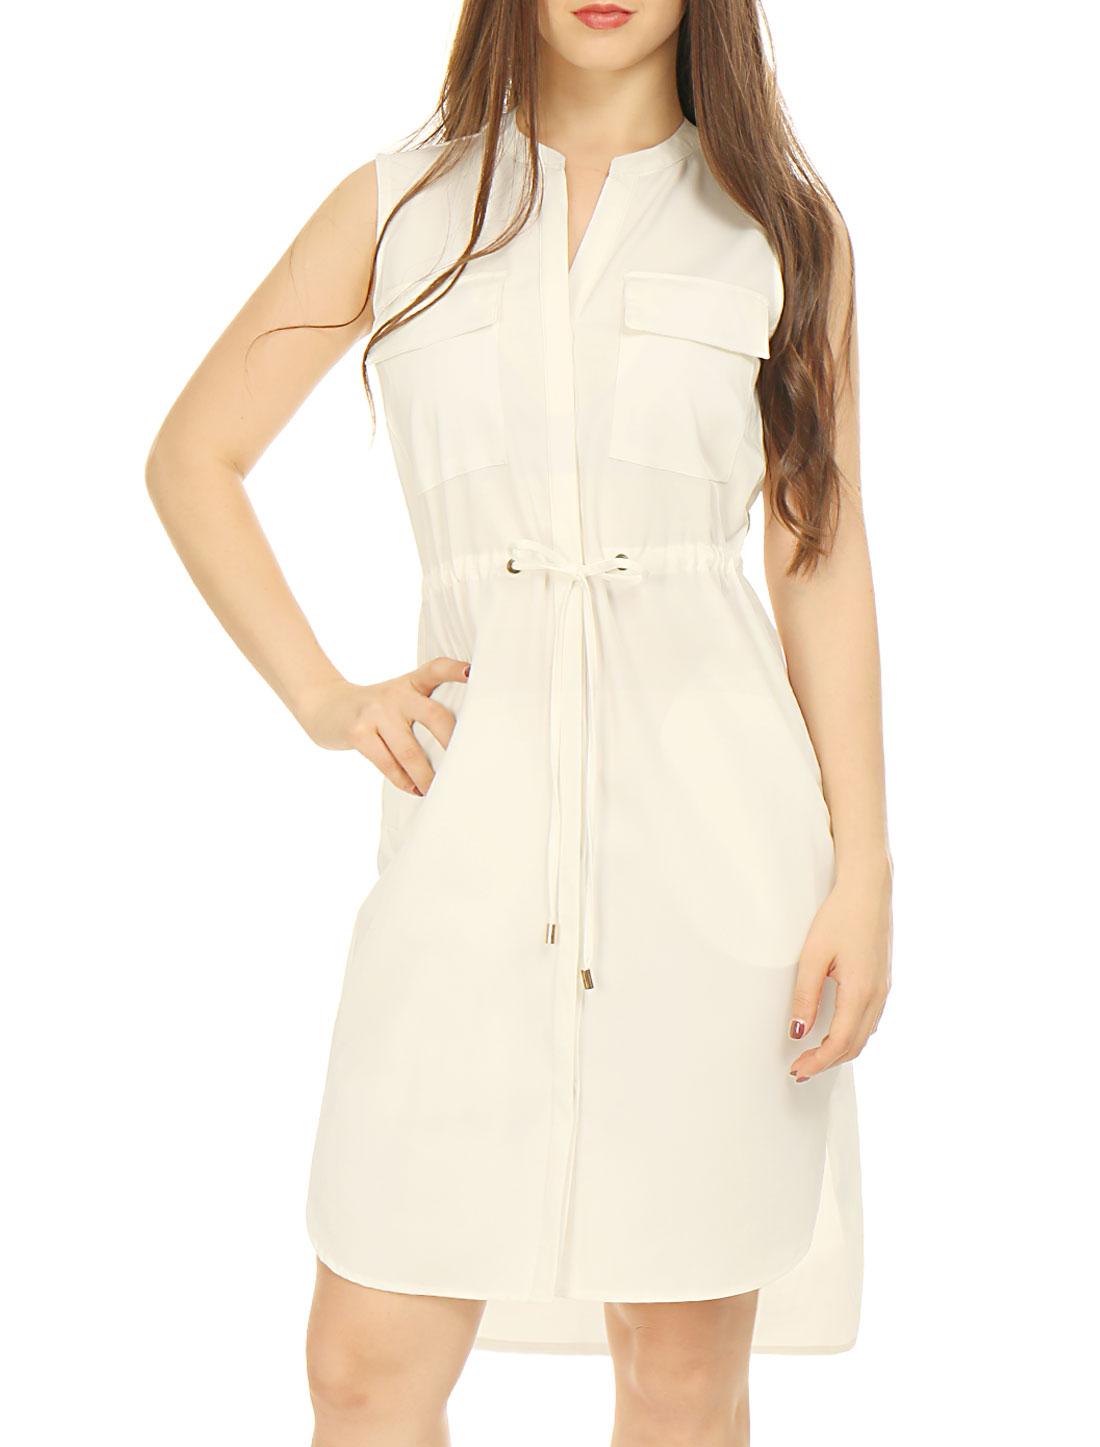 Woman Single Breasted Drawstring Sleeveless Dress Beige S